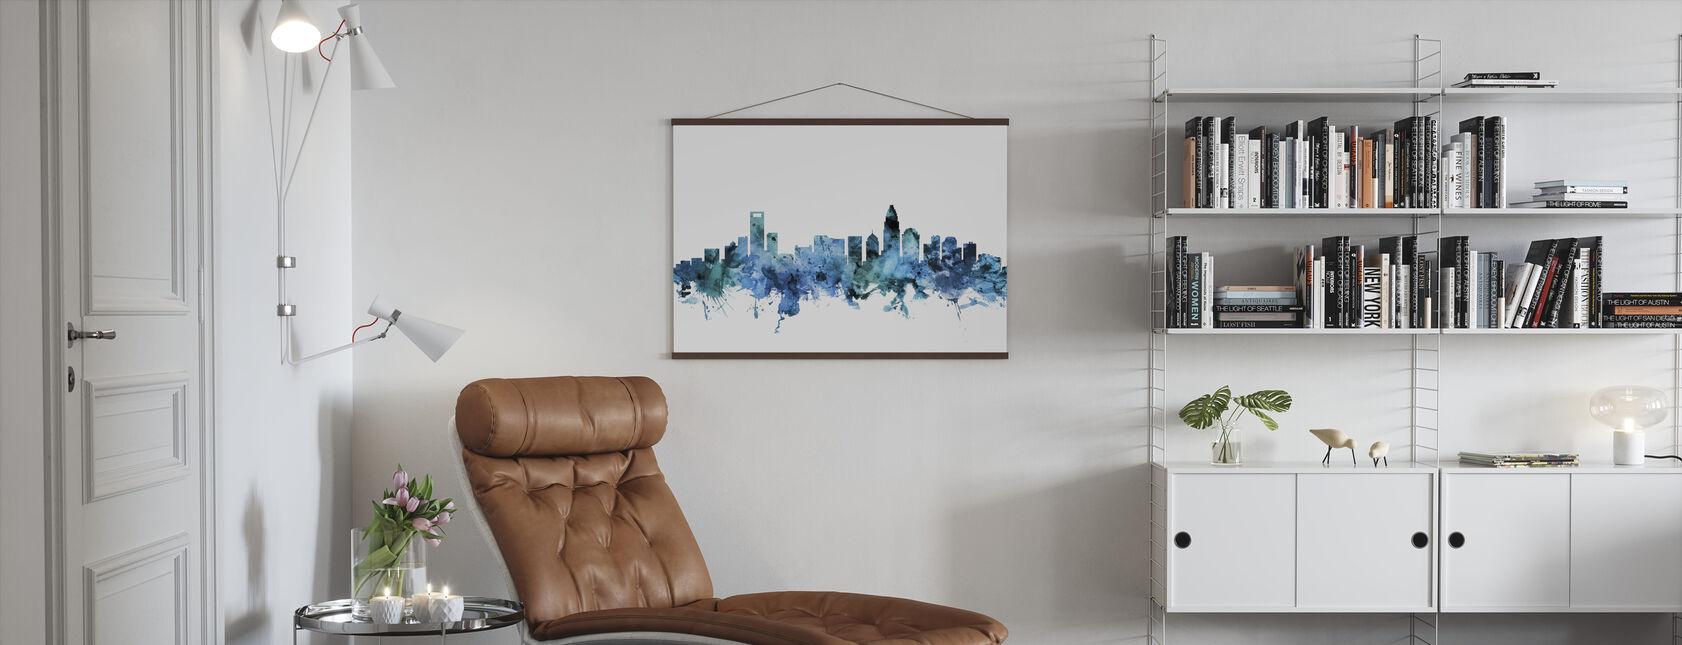 Charlotte North Carolina Skyline - Poster - Living Room